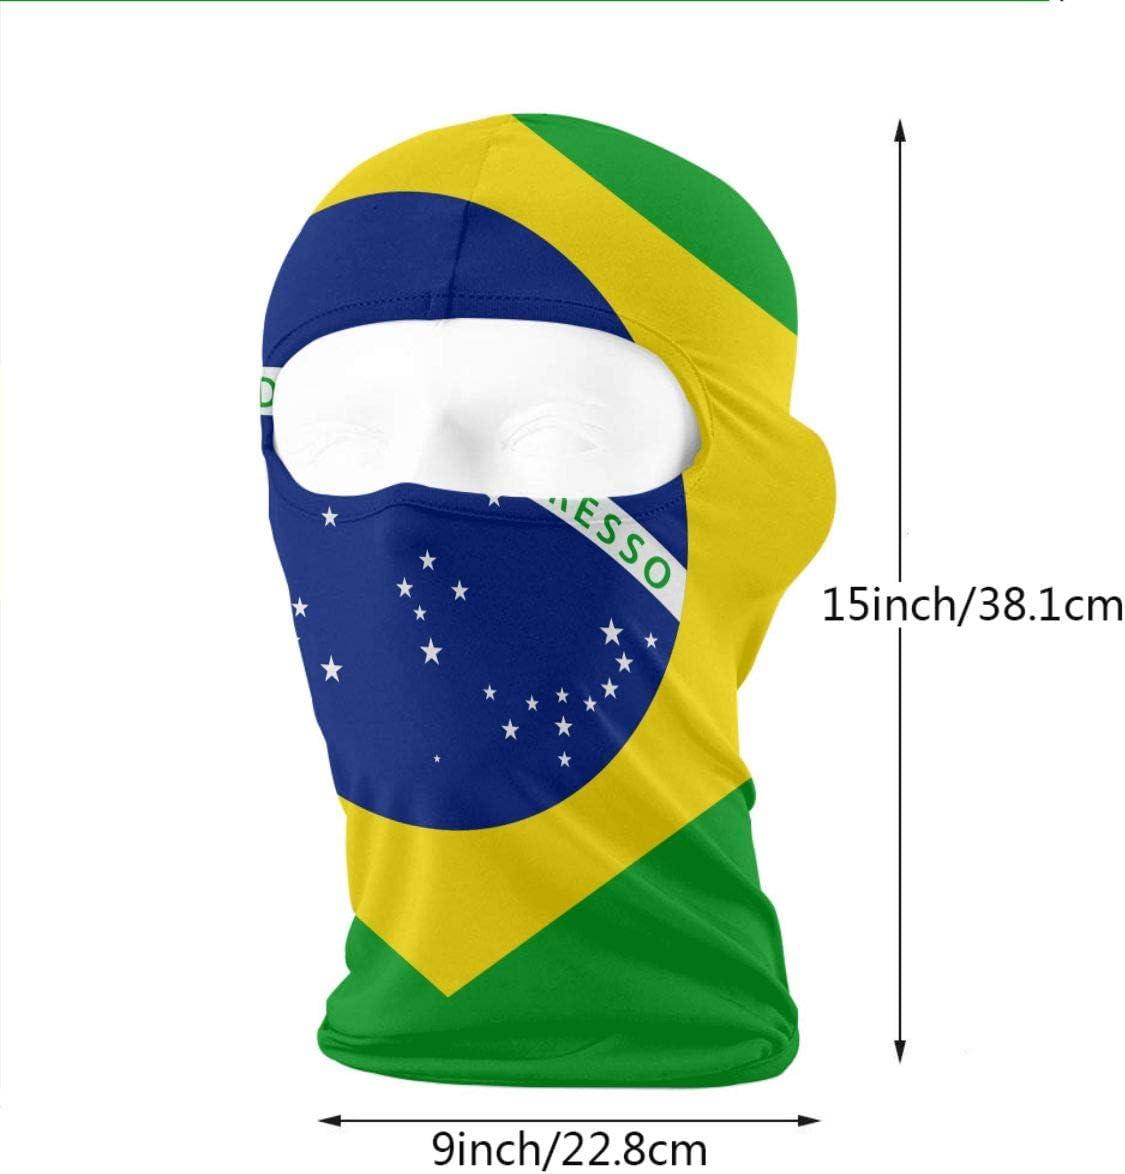 Wind-Resistant Face Mask LaoJi Brazil Flags and Buildings Winter Ski Mask Balaclava Hood